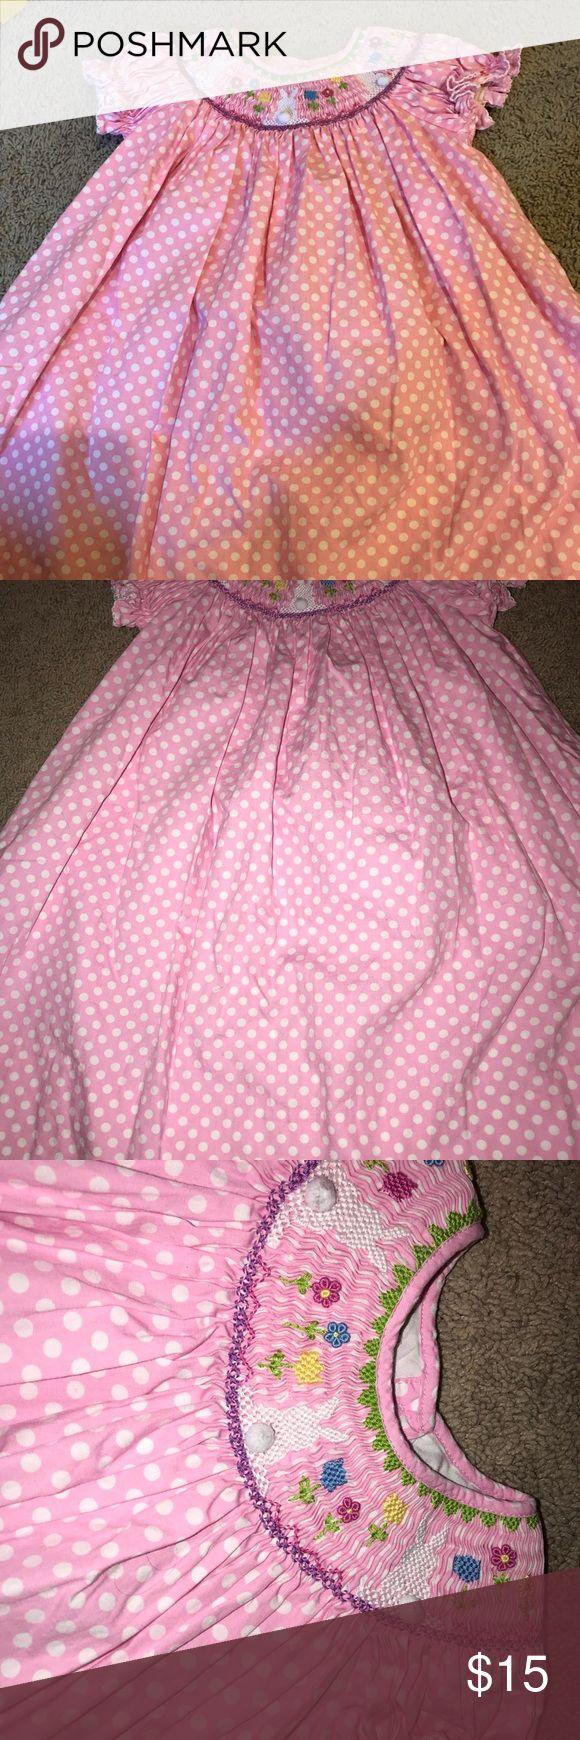 Smocked Easter dress 3t pink polka dot bunny Cute smoked Easter dress with bunny's. Fun print! Great shape! Sf/pf home Dresses Casual